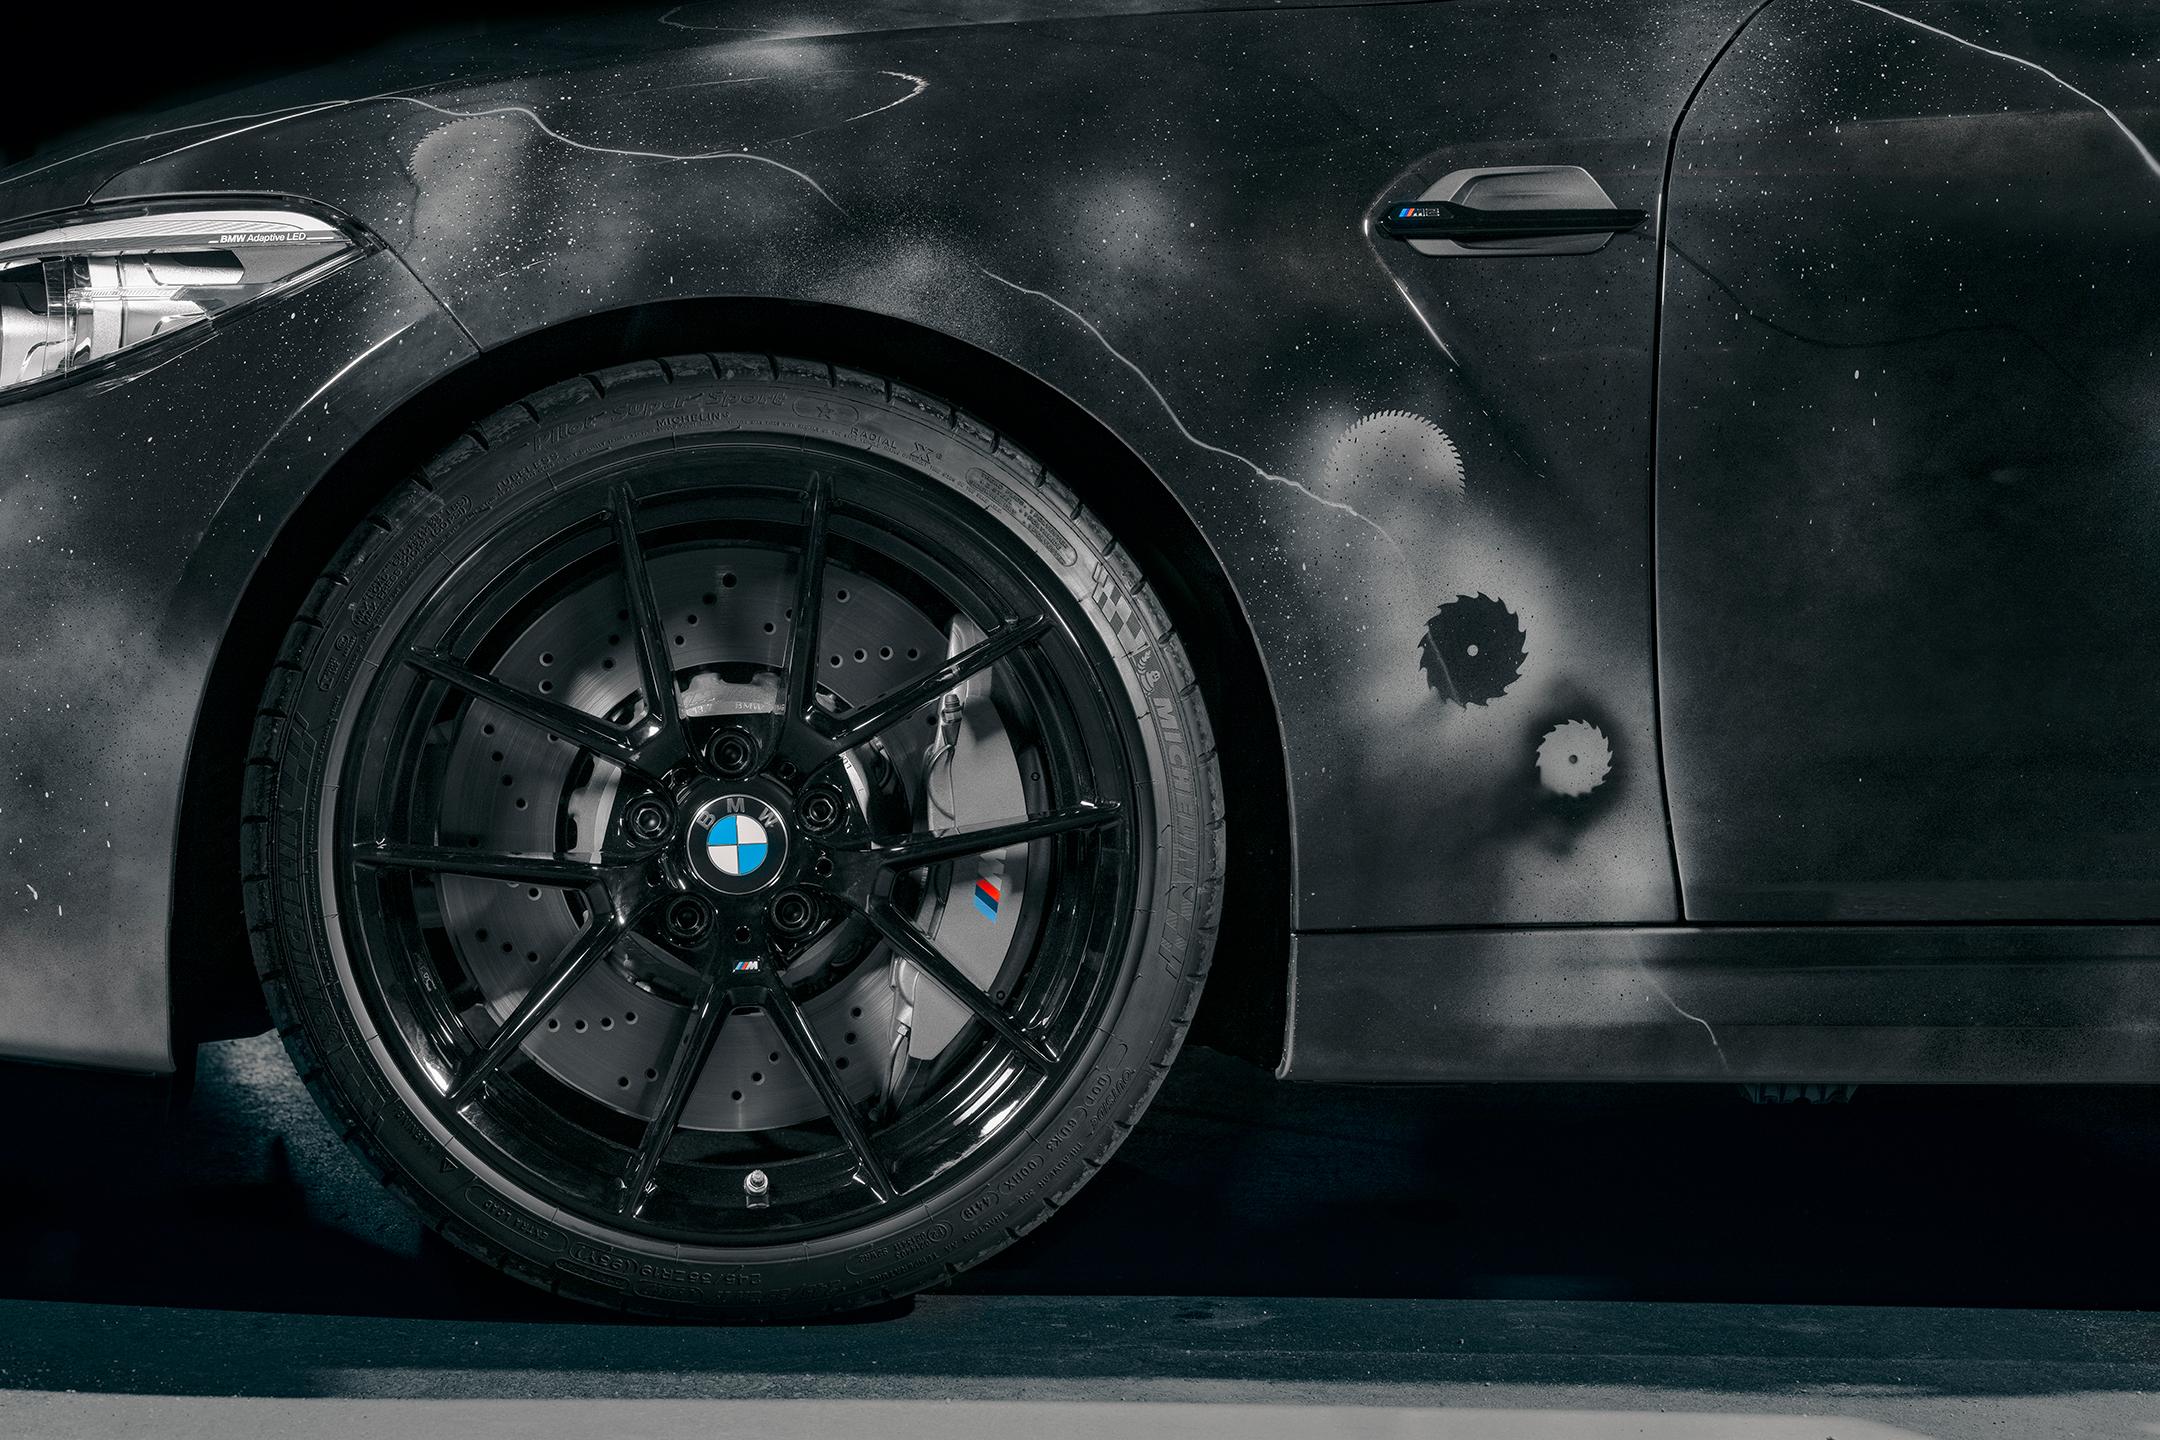 BMW M2 by FUTURA 2000 - Street Art Car - 2020 - wheel / jante - tyre / pneu - Michelin